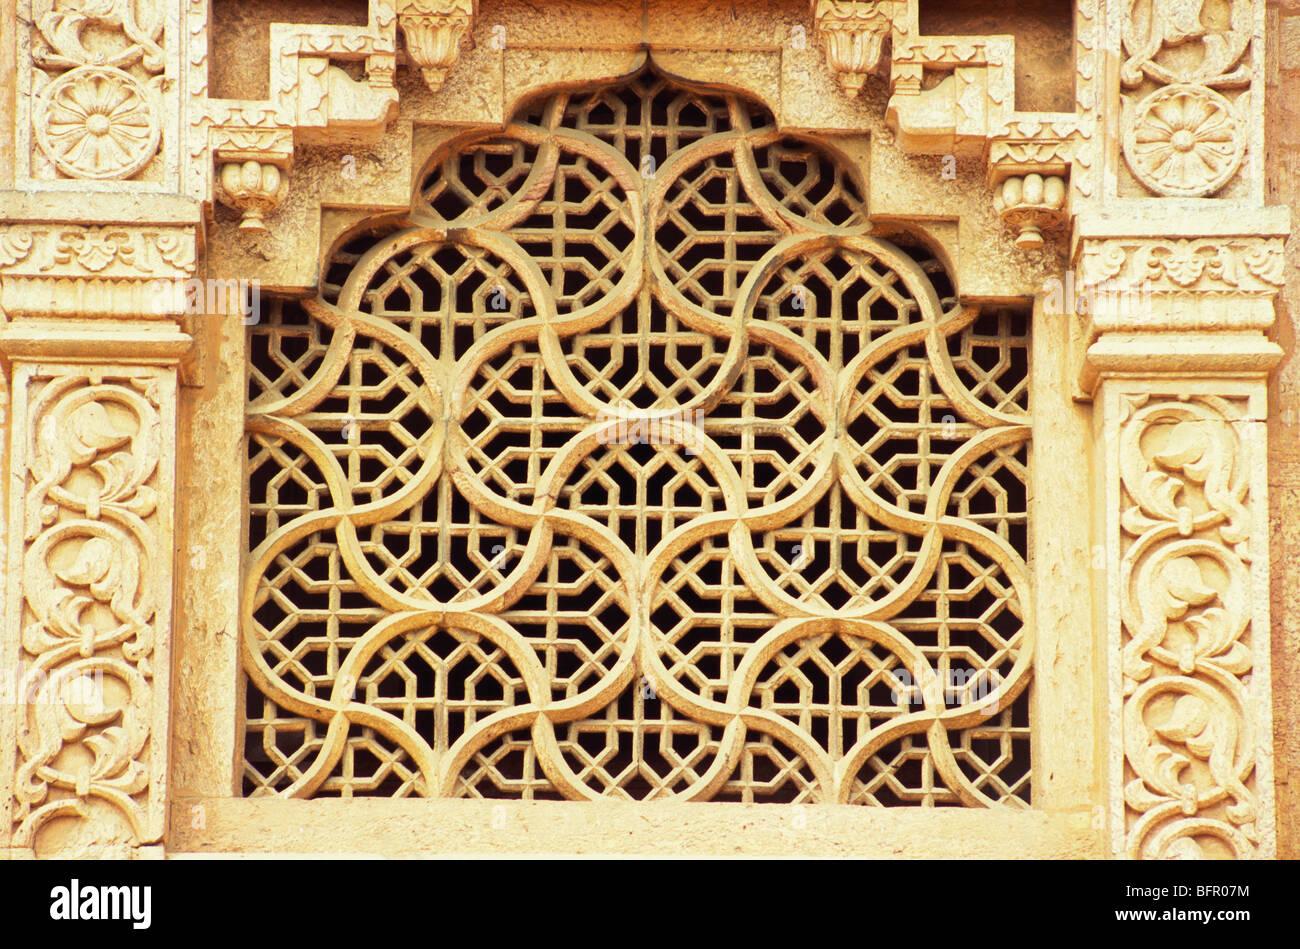 Nmk richly stone carved jali at national art